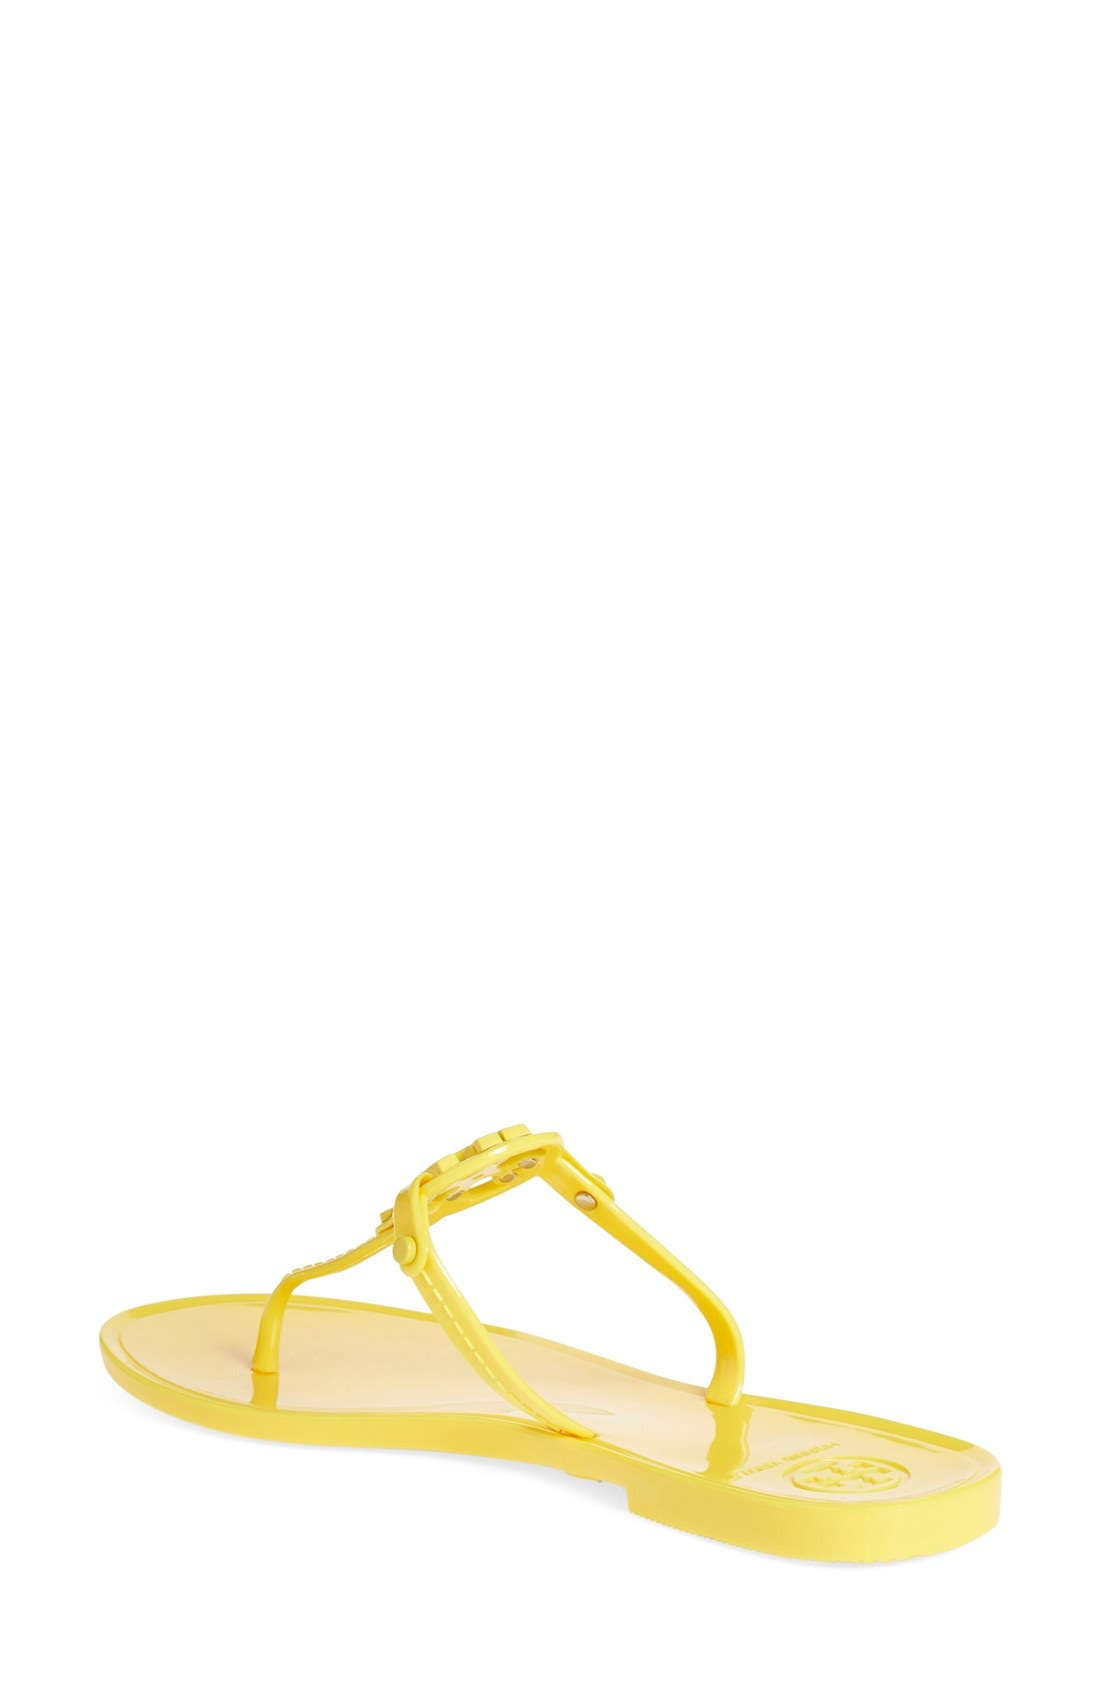 Alternate Image 2  - Tory Burch Jelly Thong Sandal (Women)